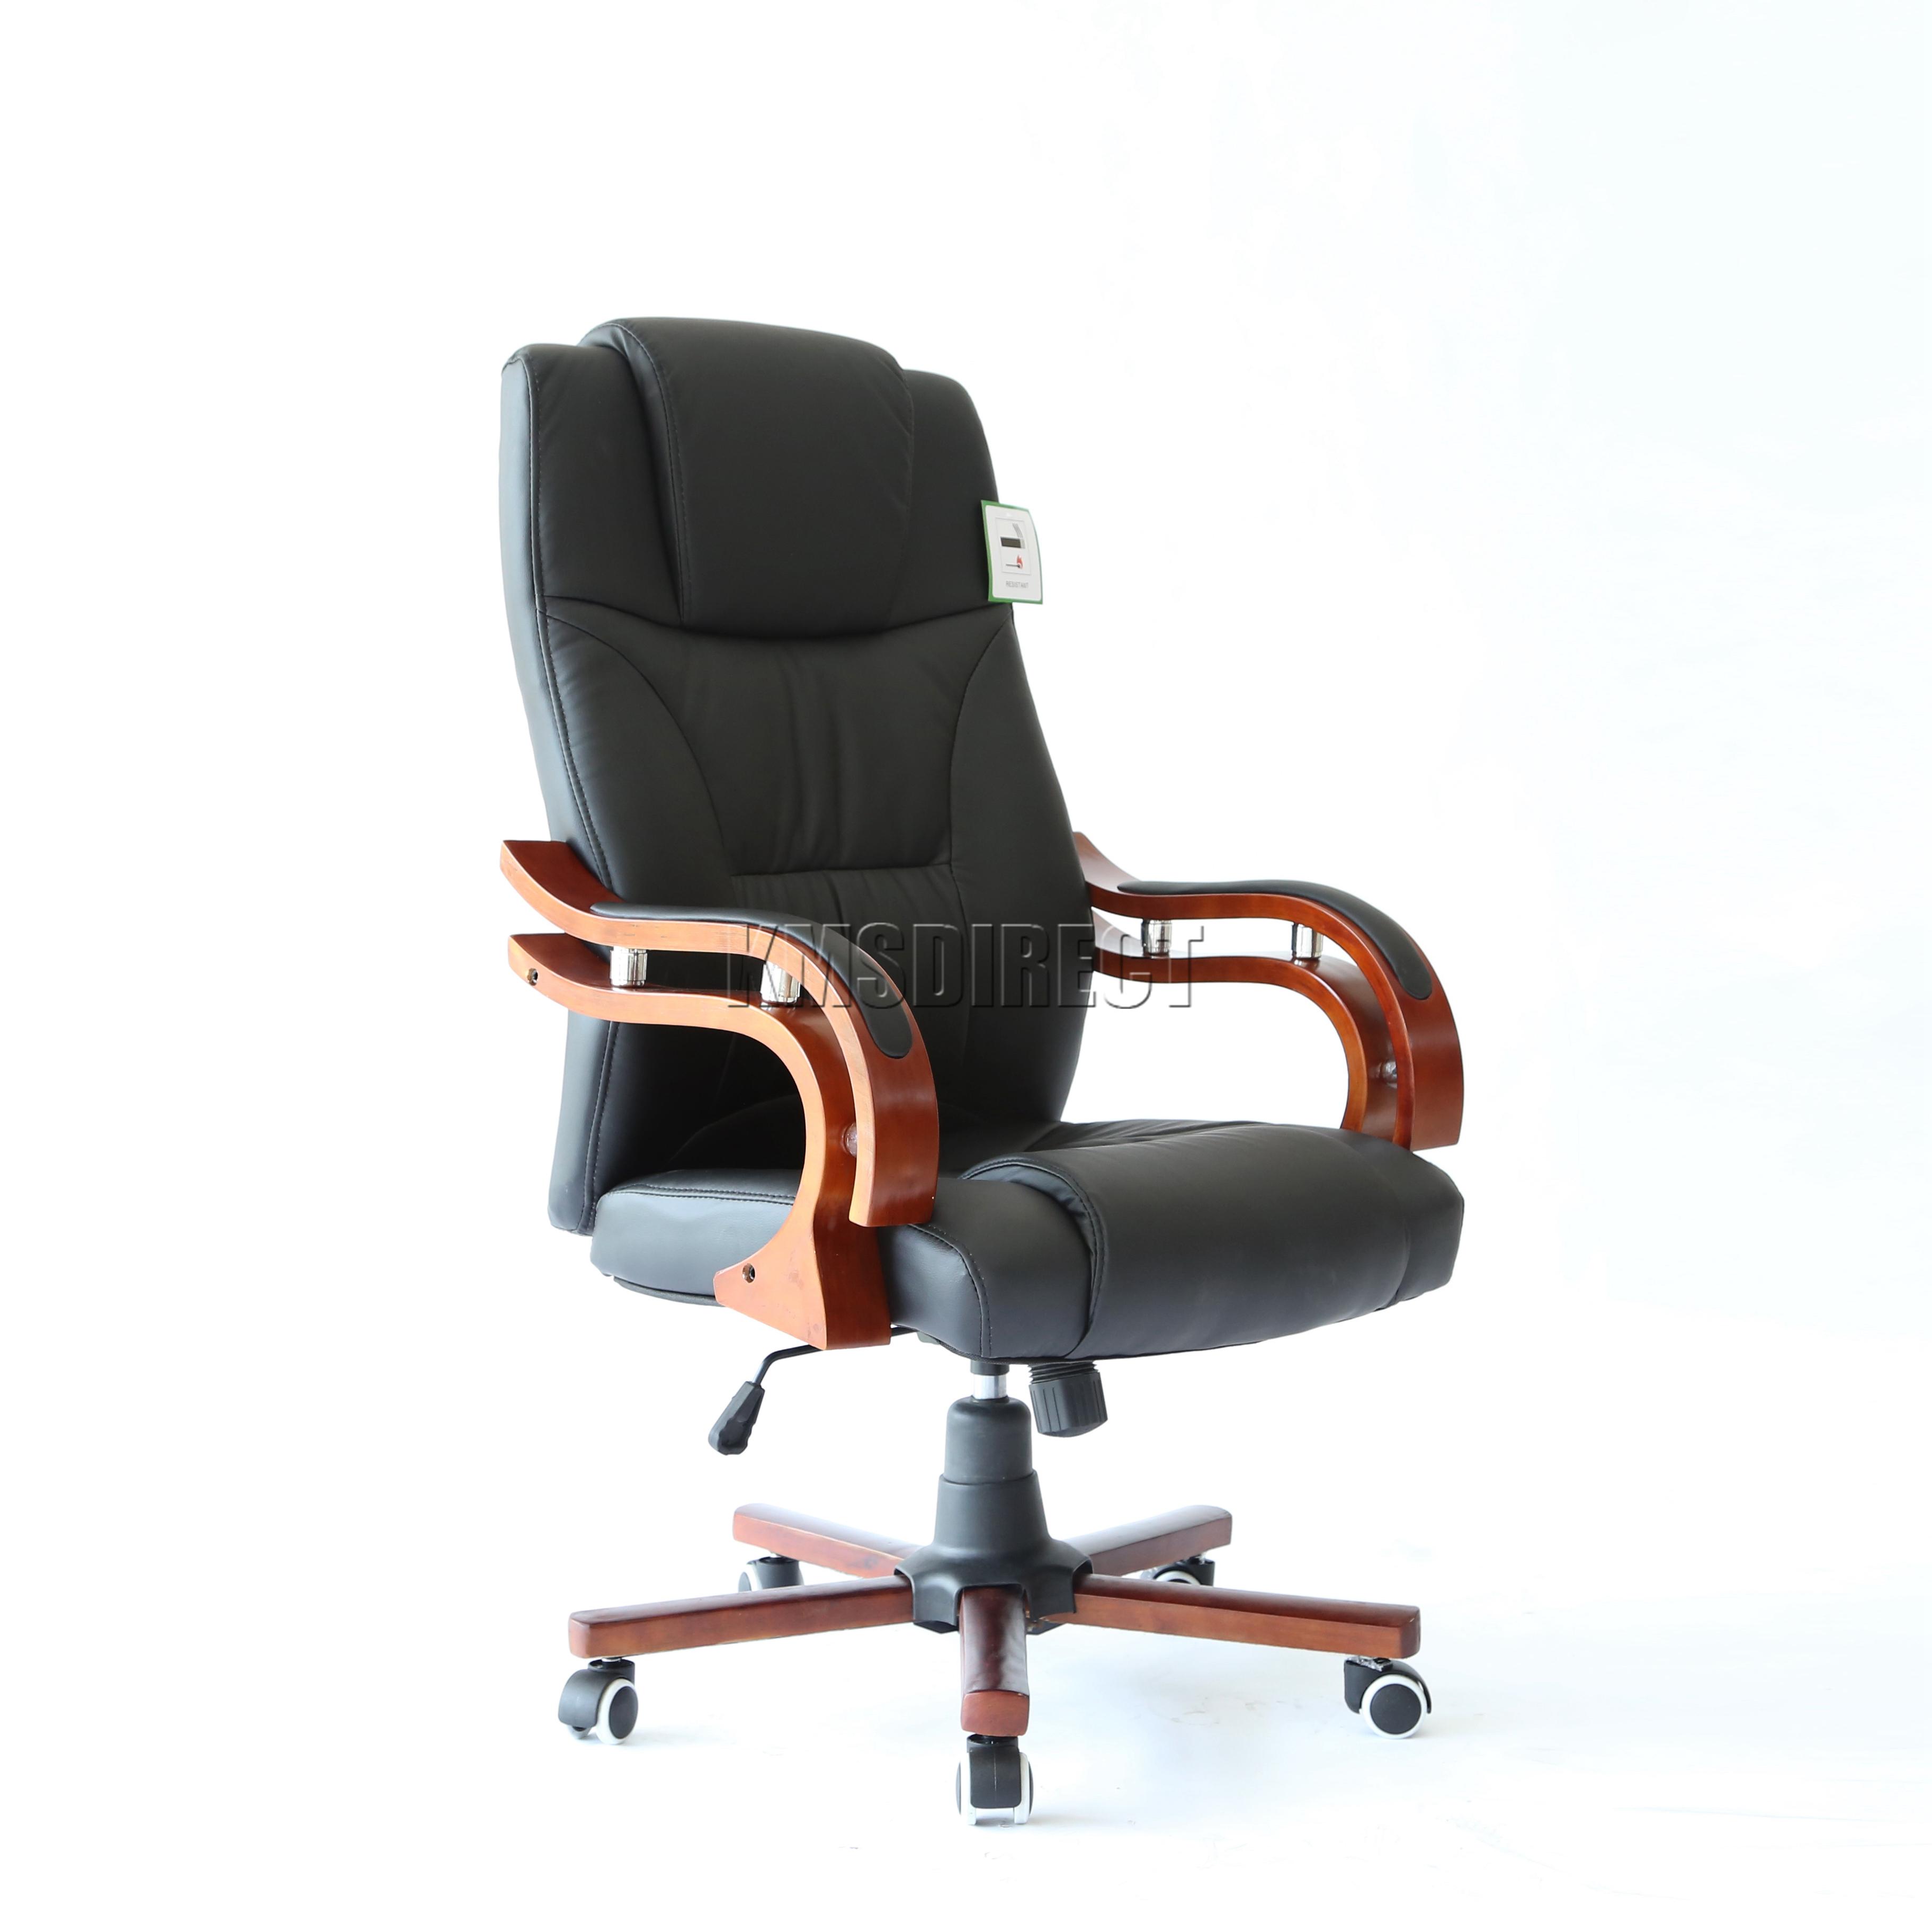 desk chair ebay uk telescope casual beach foxhunter computer executive office pu leather